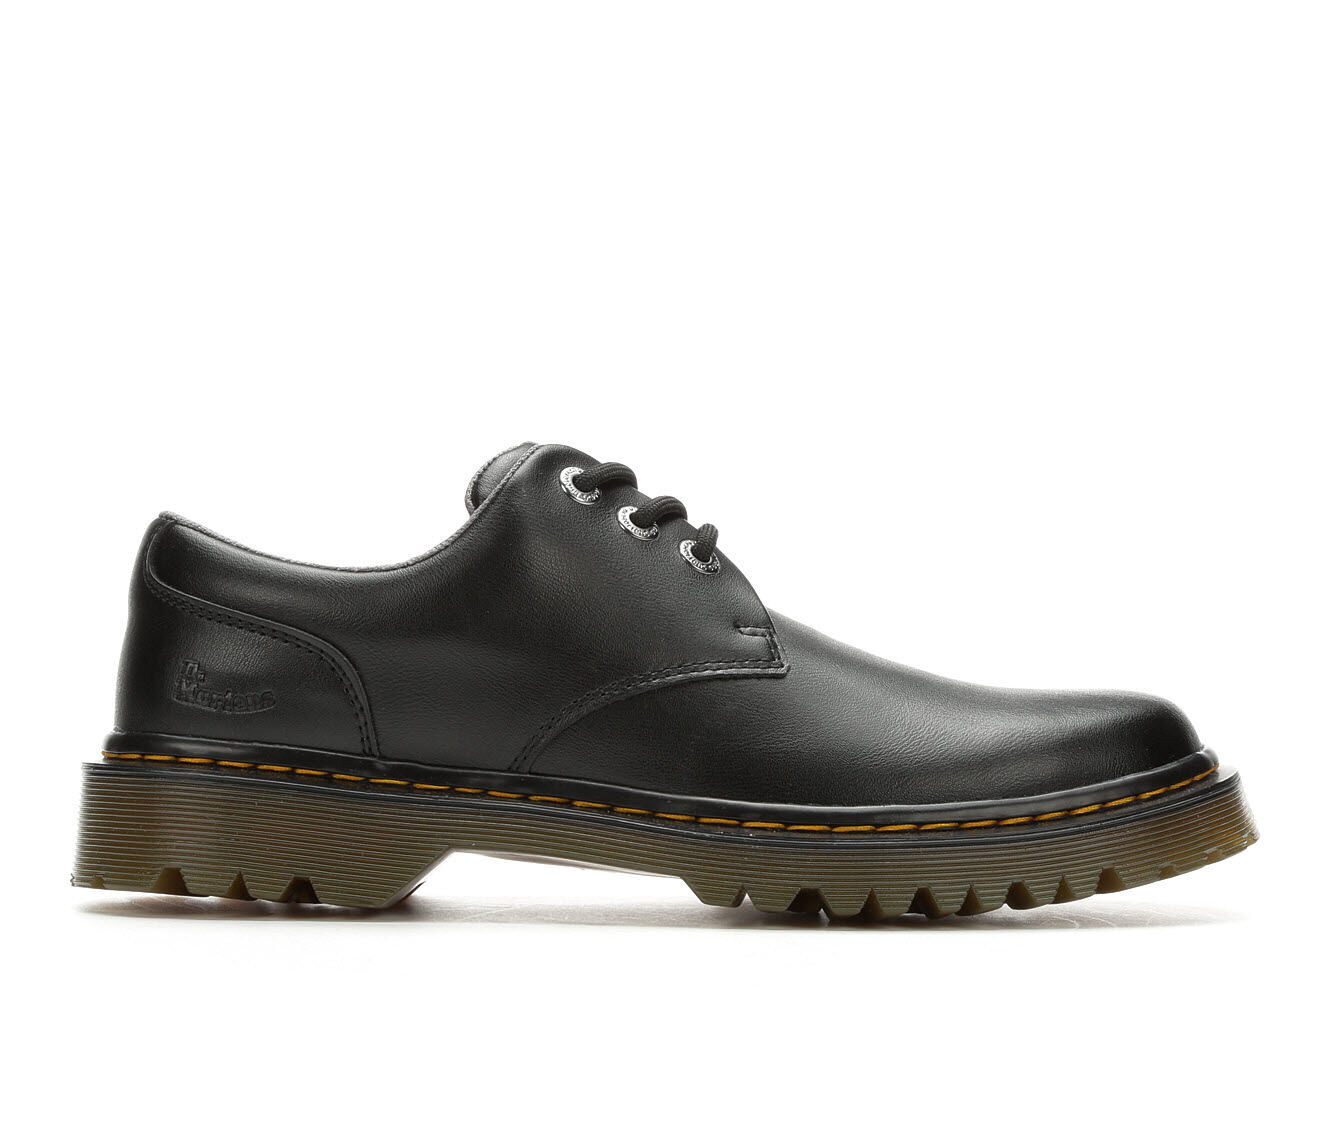 uk shoes_kd1423